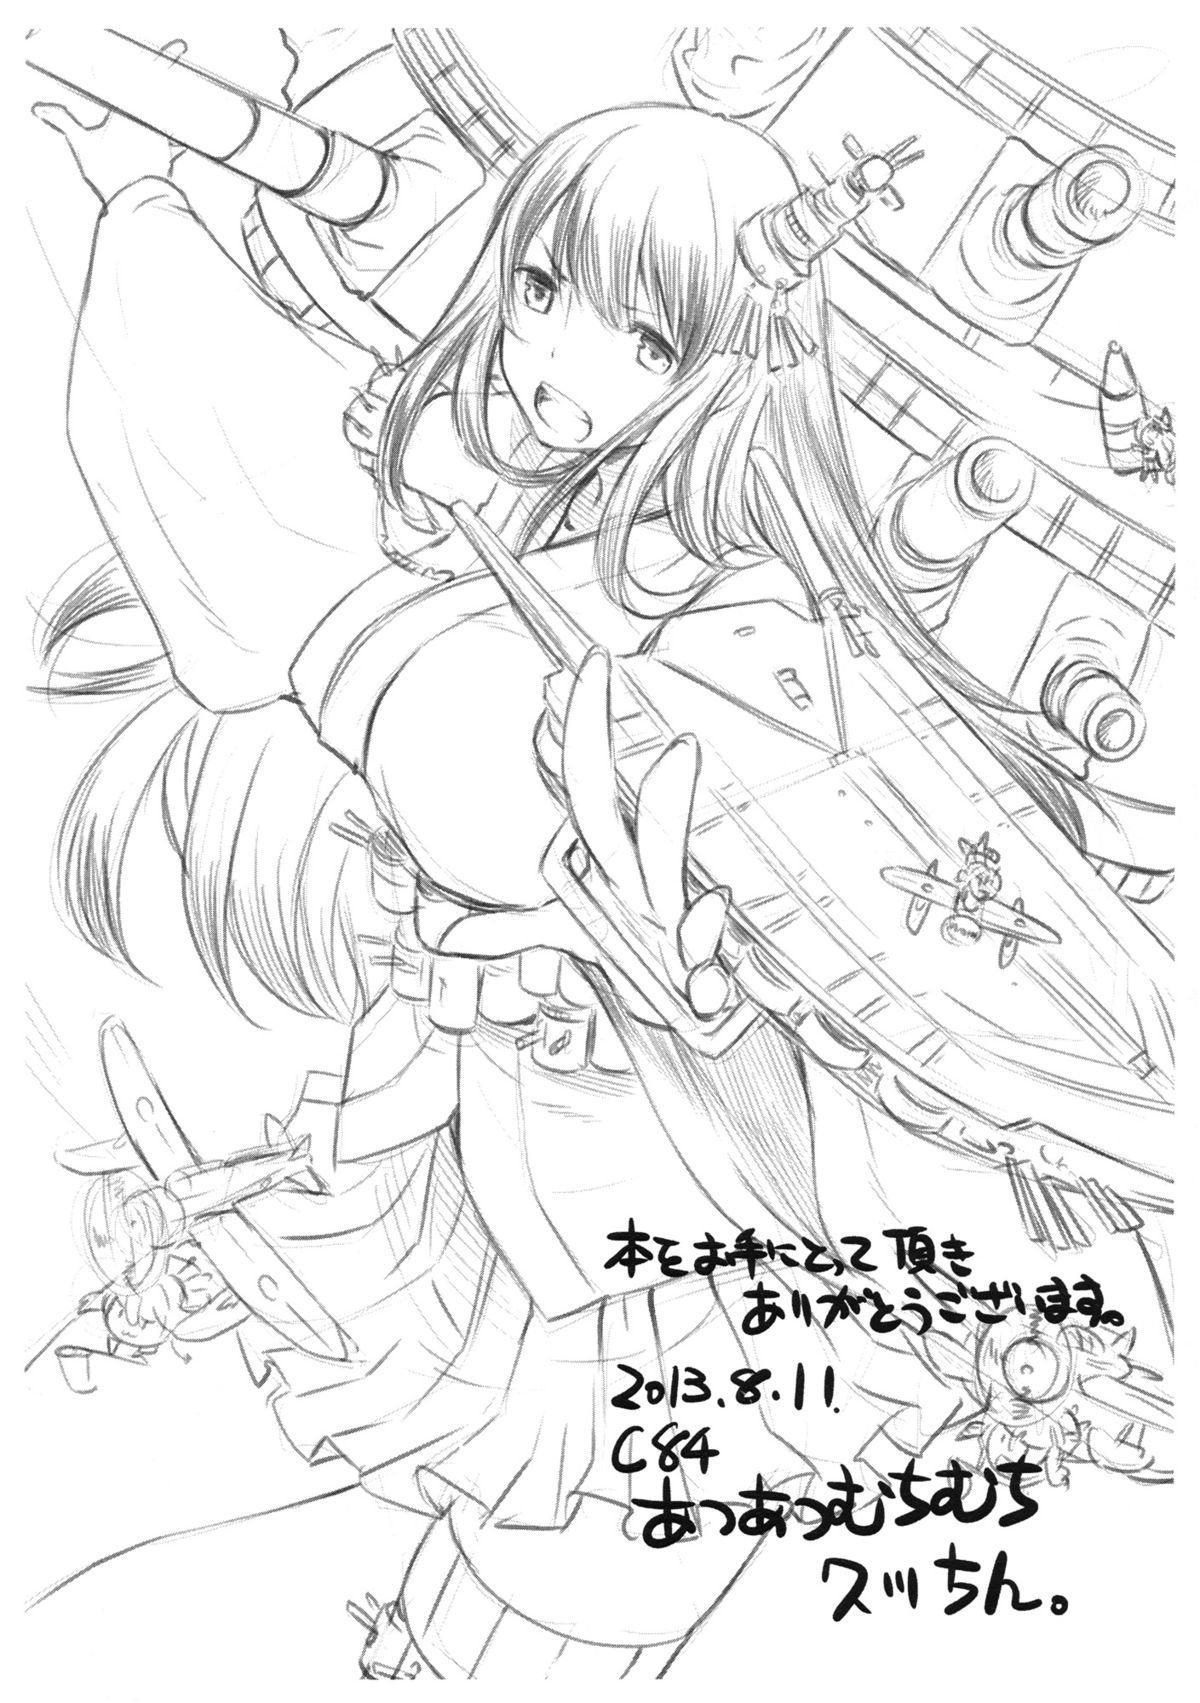 Aru P no Idol Produce Kiroku + C83,84 Paper 23